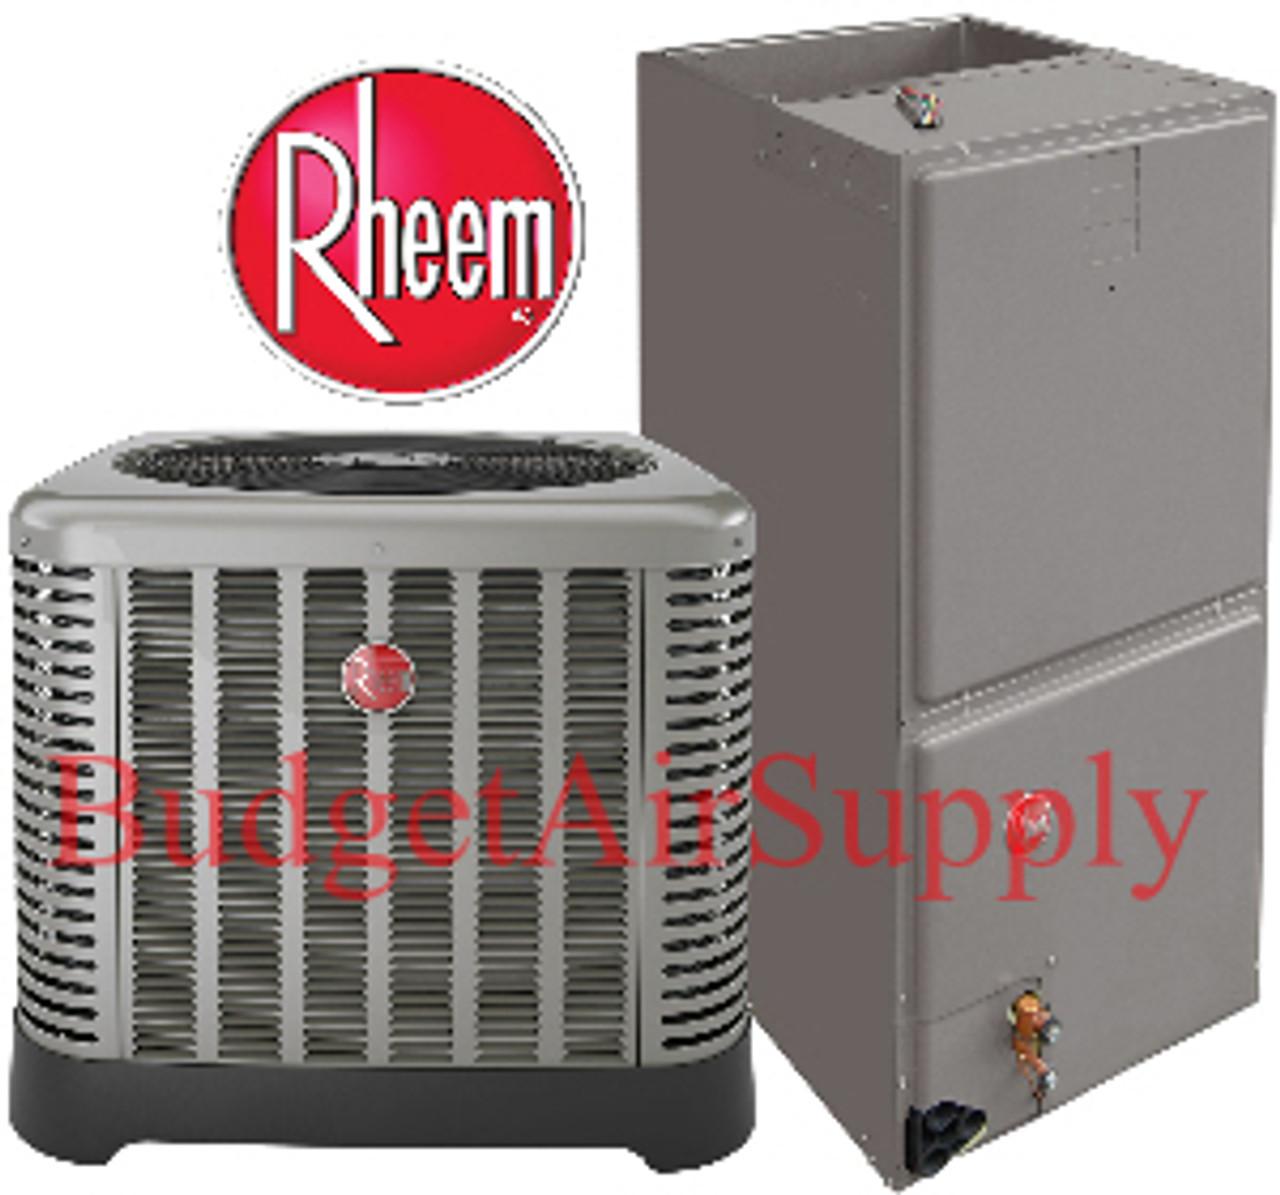 Rheem Ruud Classic 2 5 Ton 14 Seer Split Air Conditioning System Ra1430aj1 Rh1p3017stanja Budget Air Supply